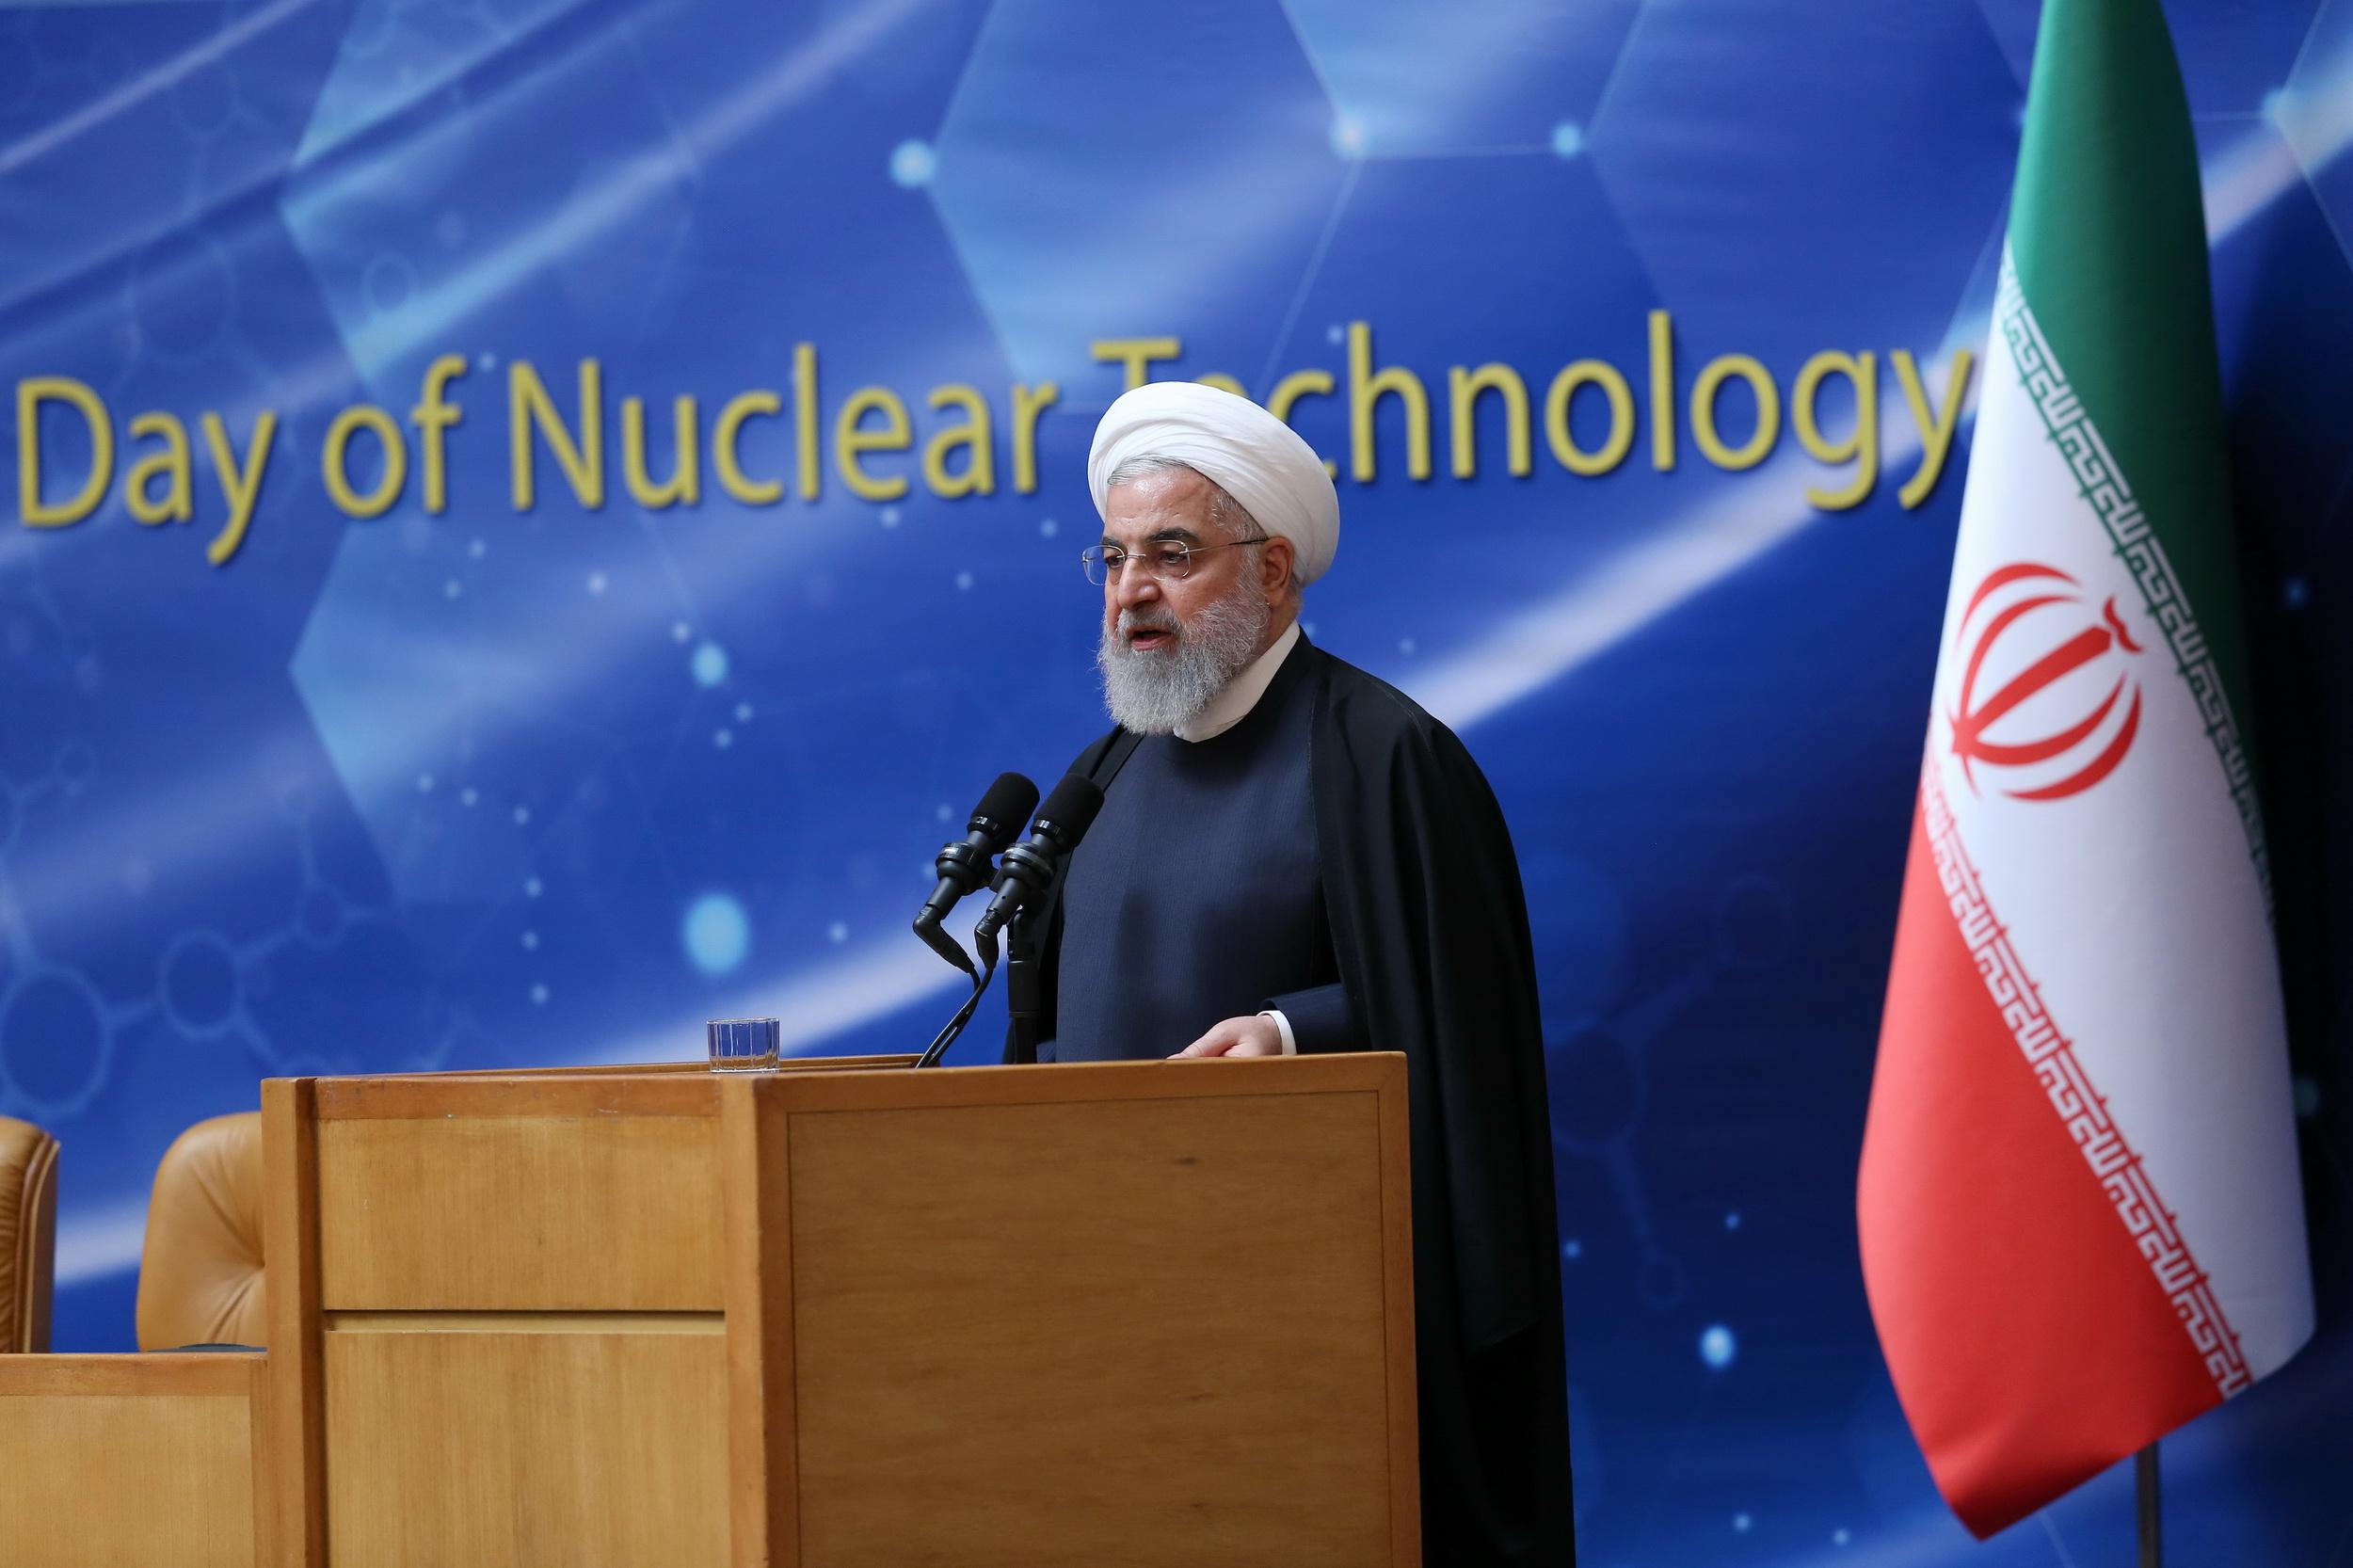 Photo Credit: President of Iran